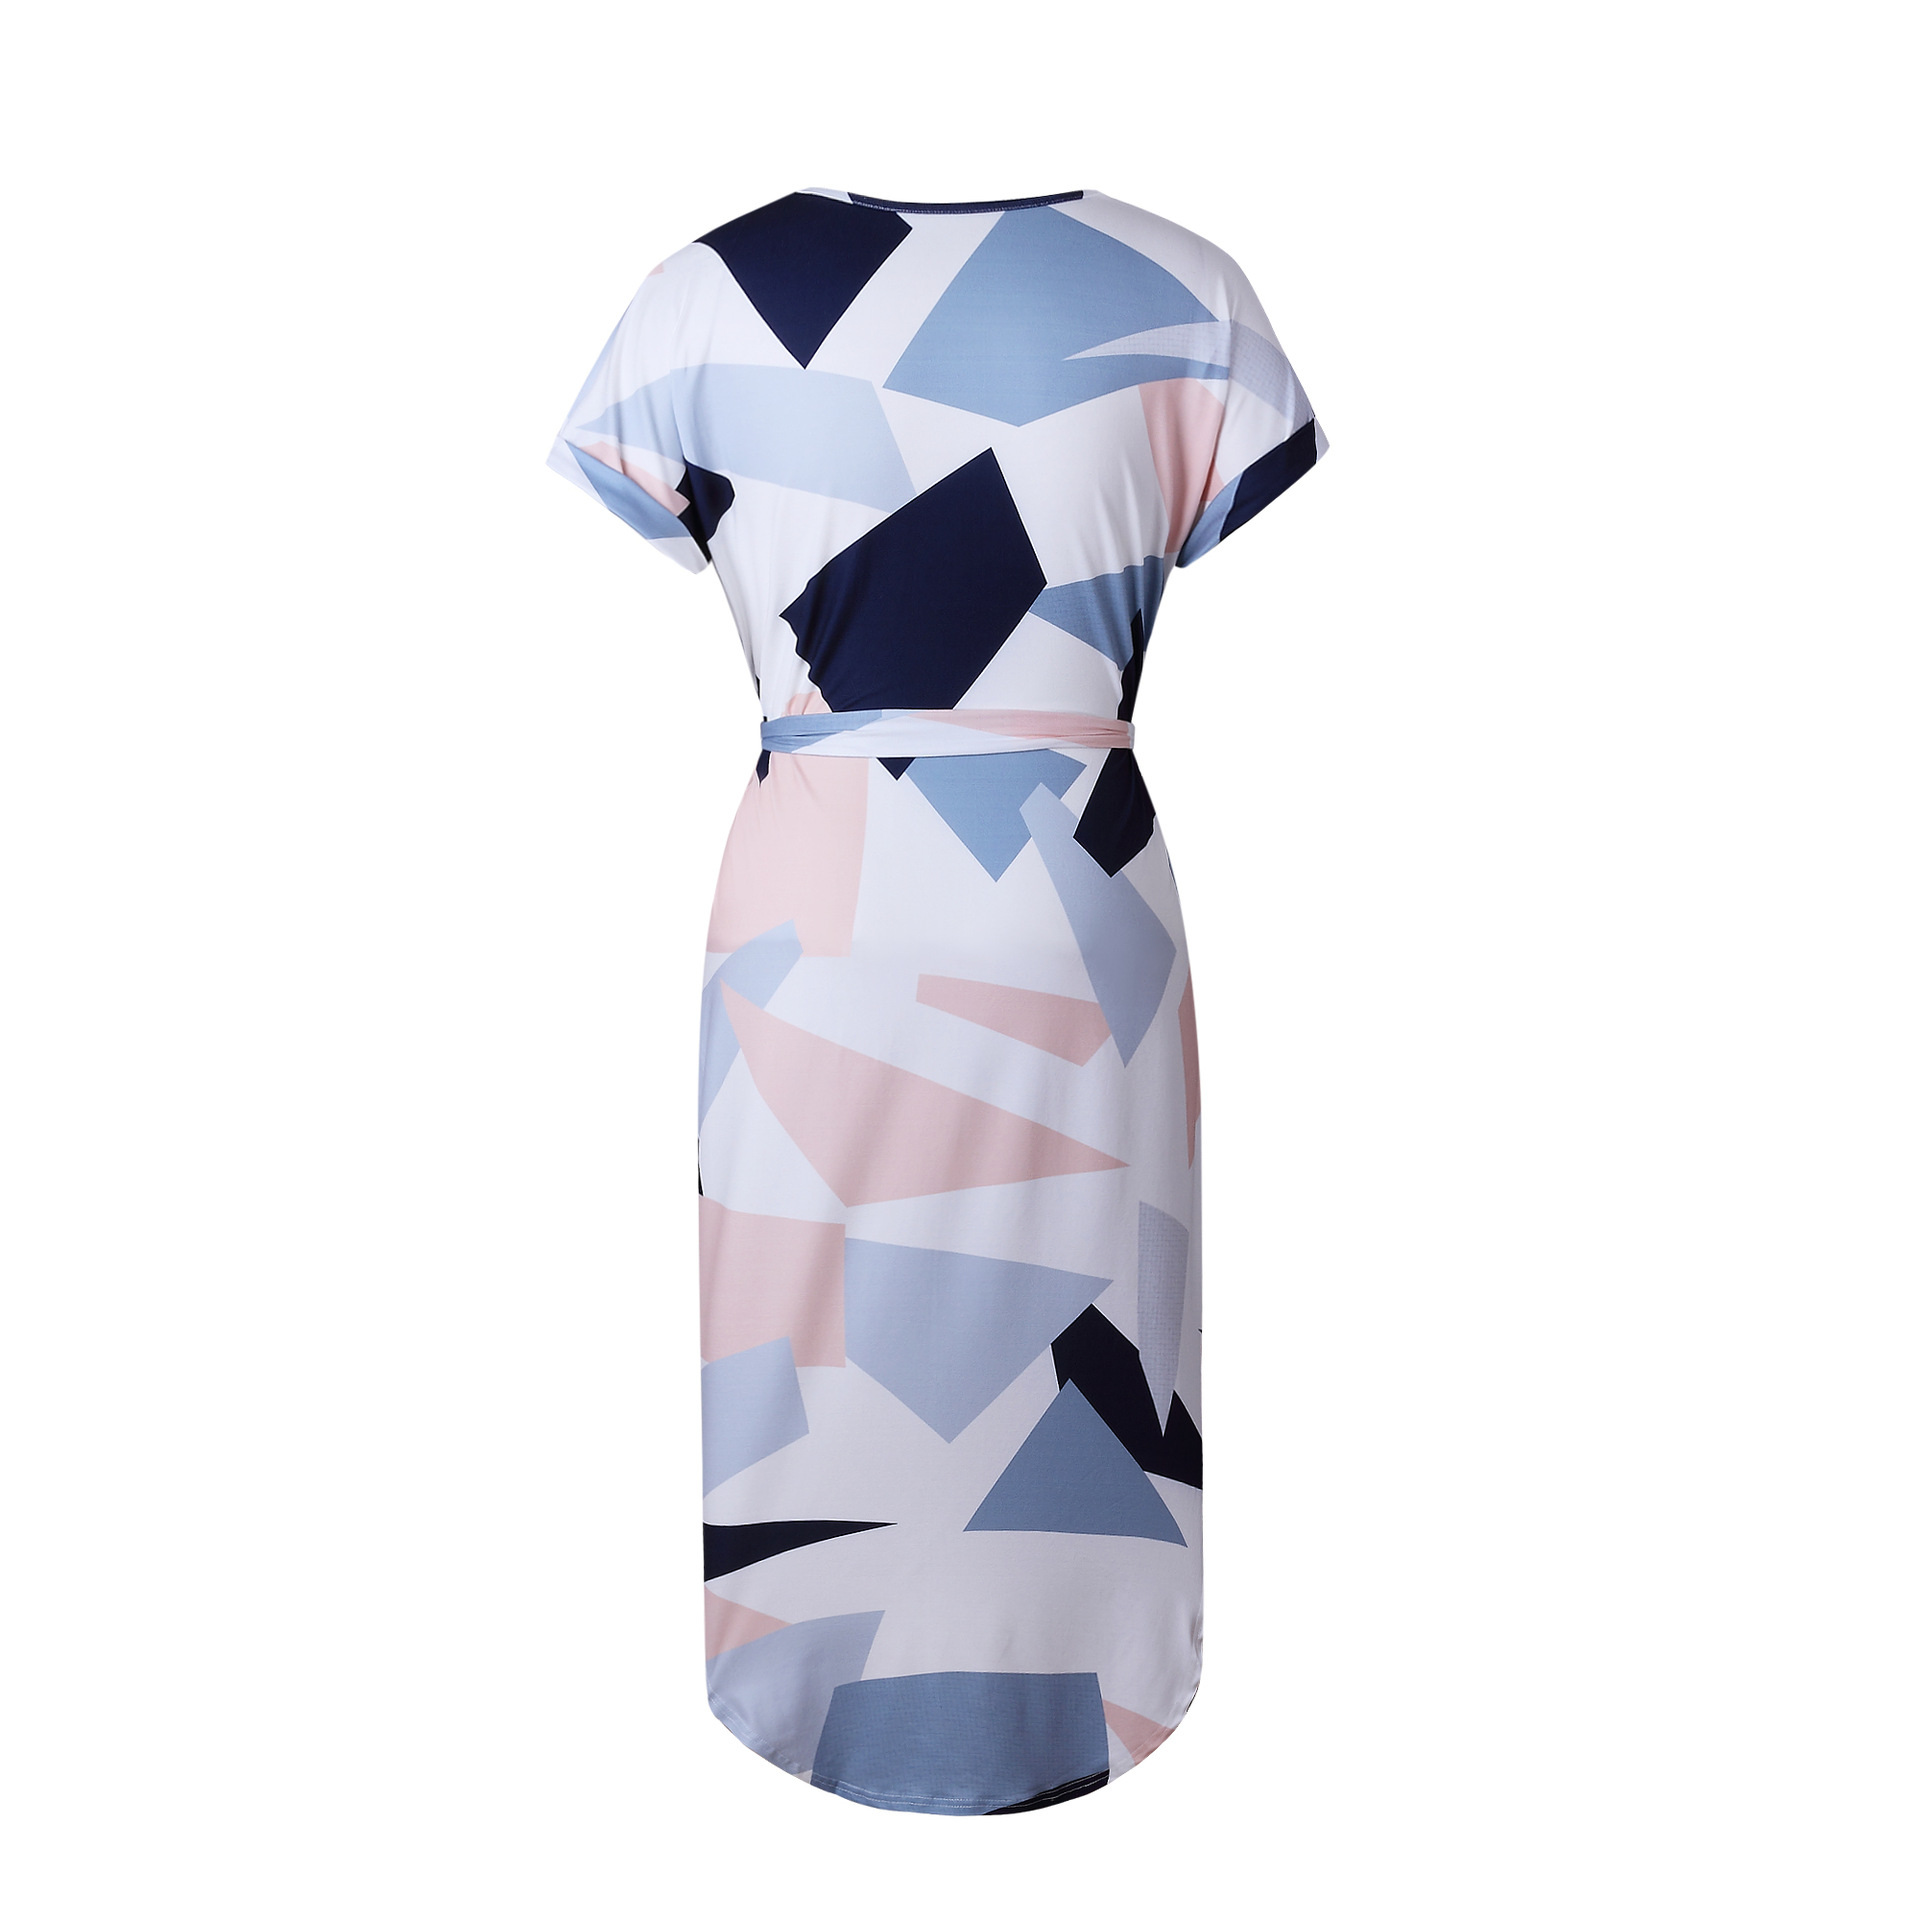 2018 Summer Dress Women Print V Neck Short Sleeve Robe Female Dresses Casual Sashes Midi Dress Ladies Elegant Vestidos Dropship 43